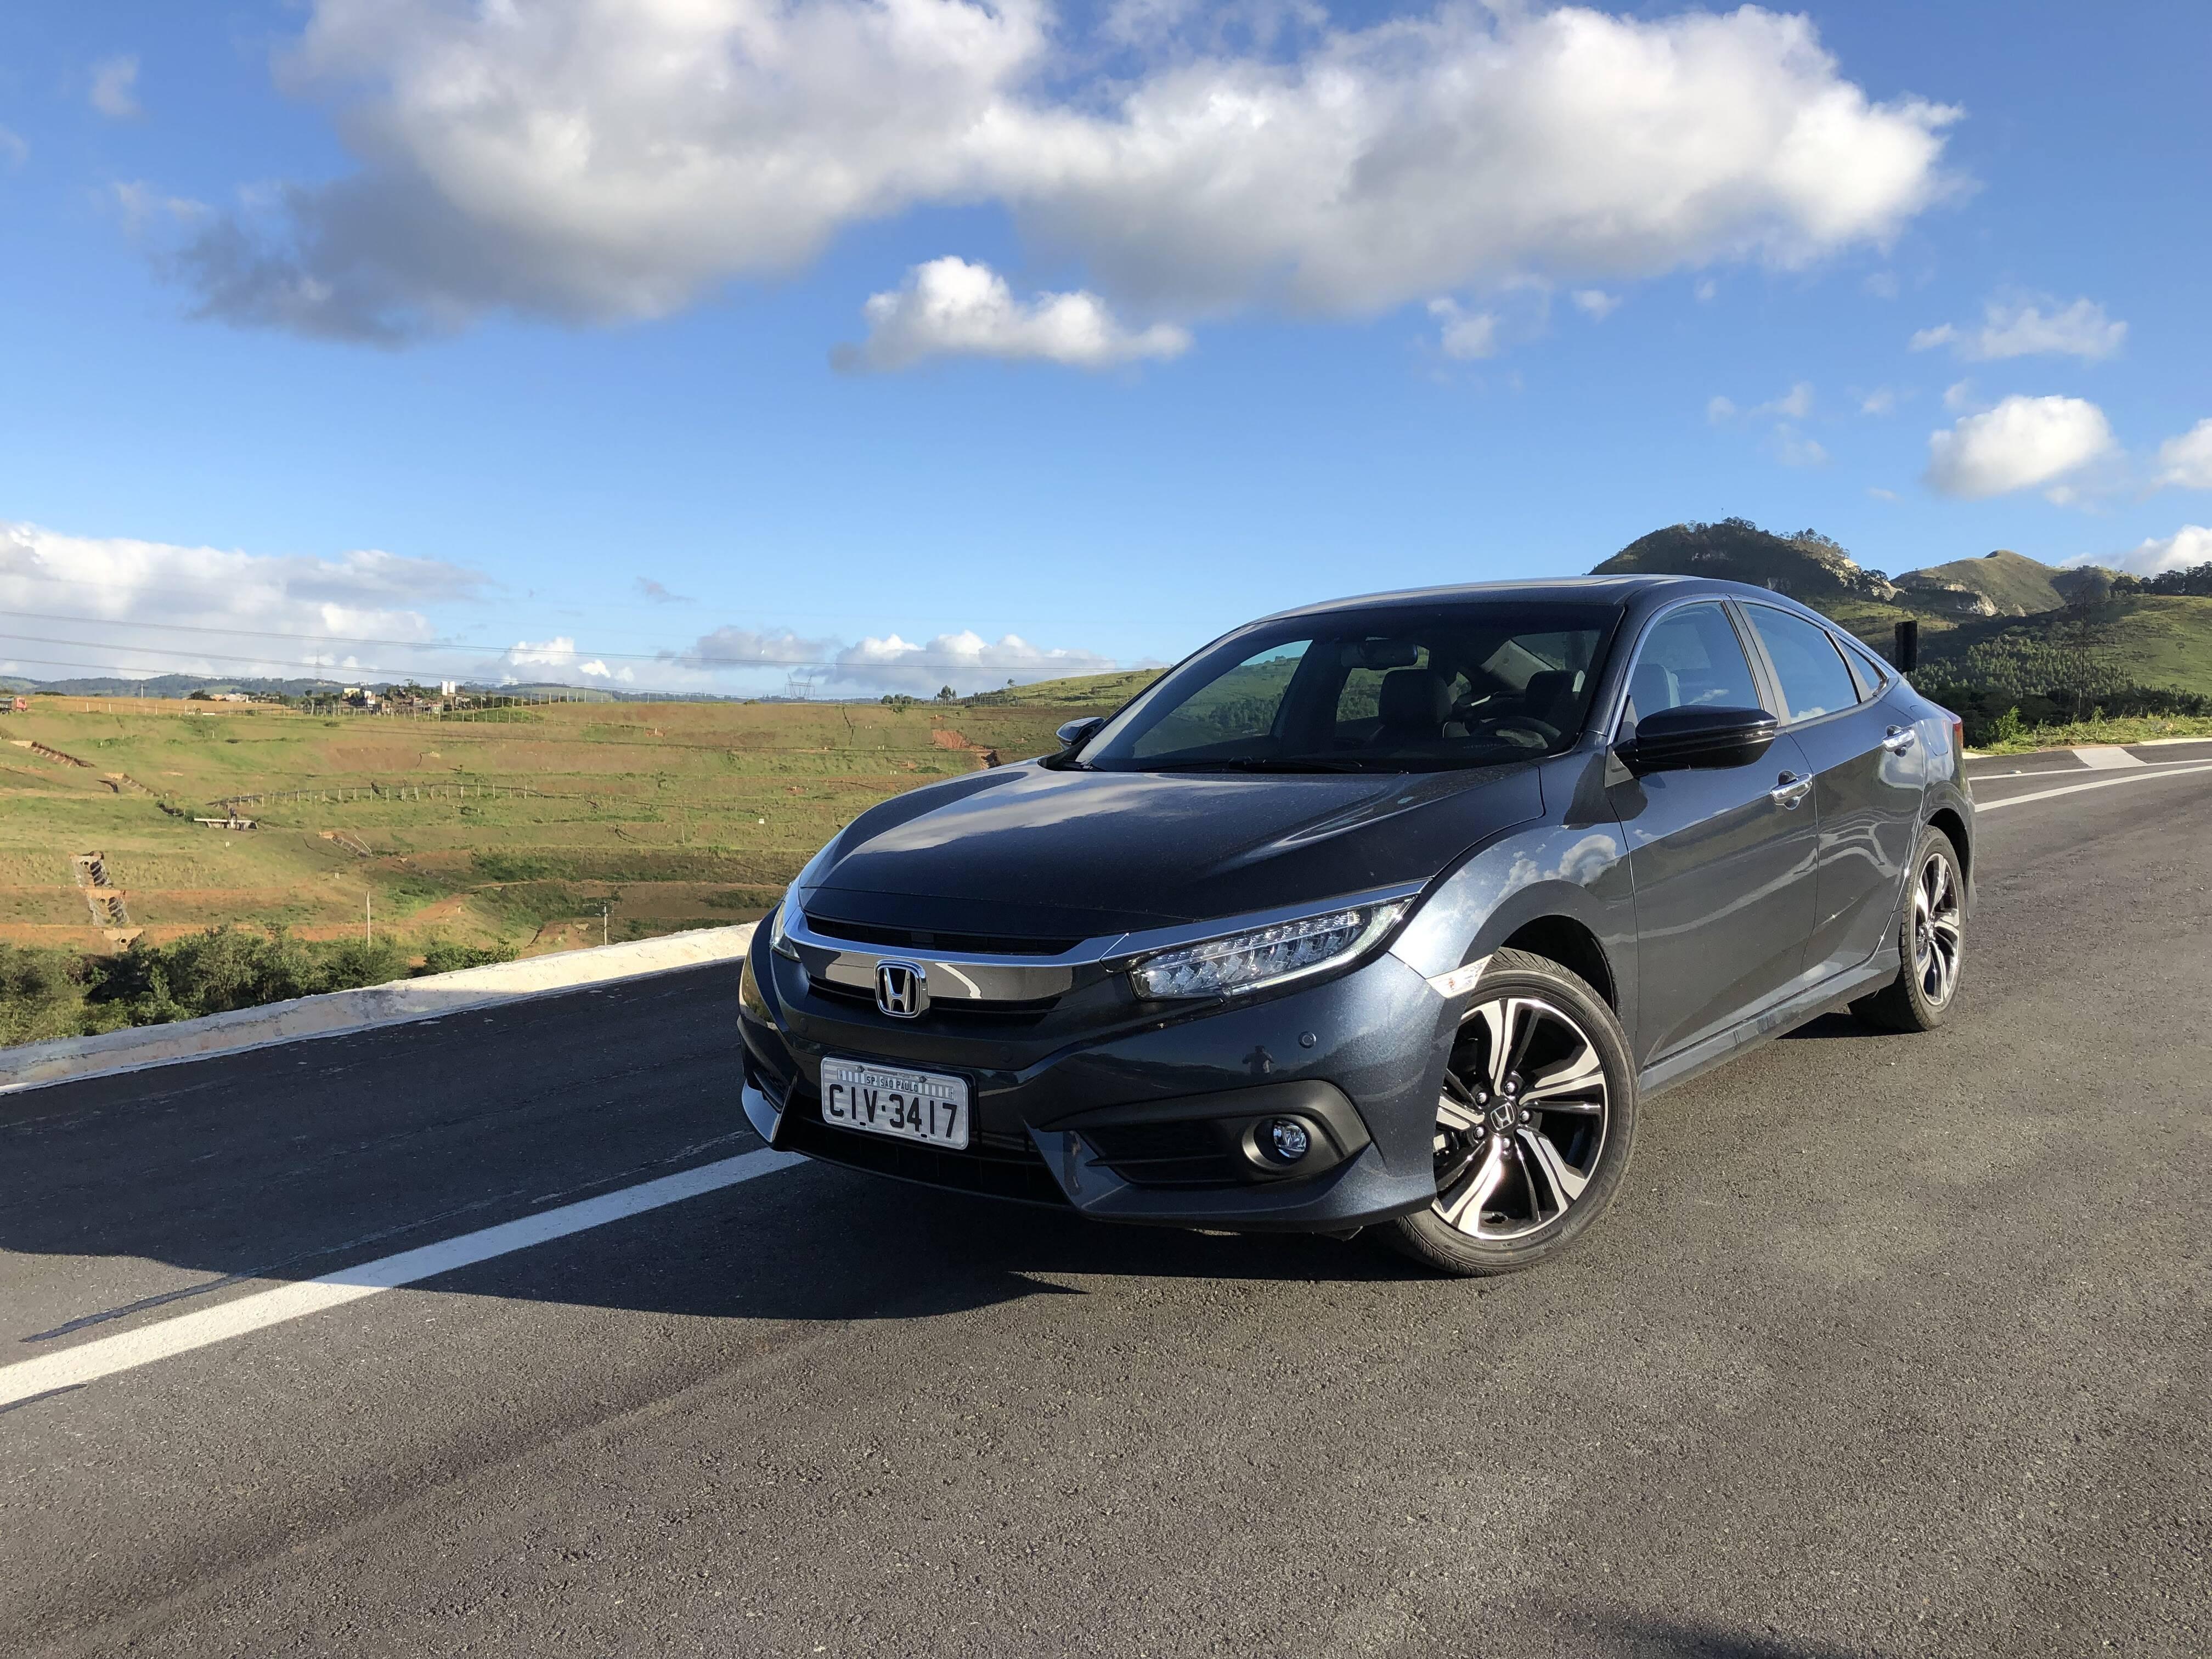 Honda Civic Touring. Foto: Leandro Alvares/iG Carros